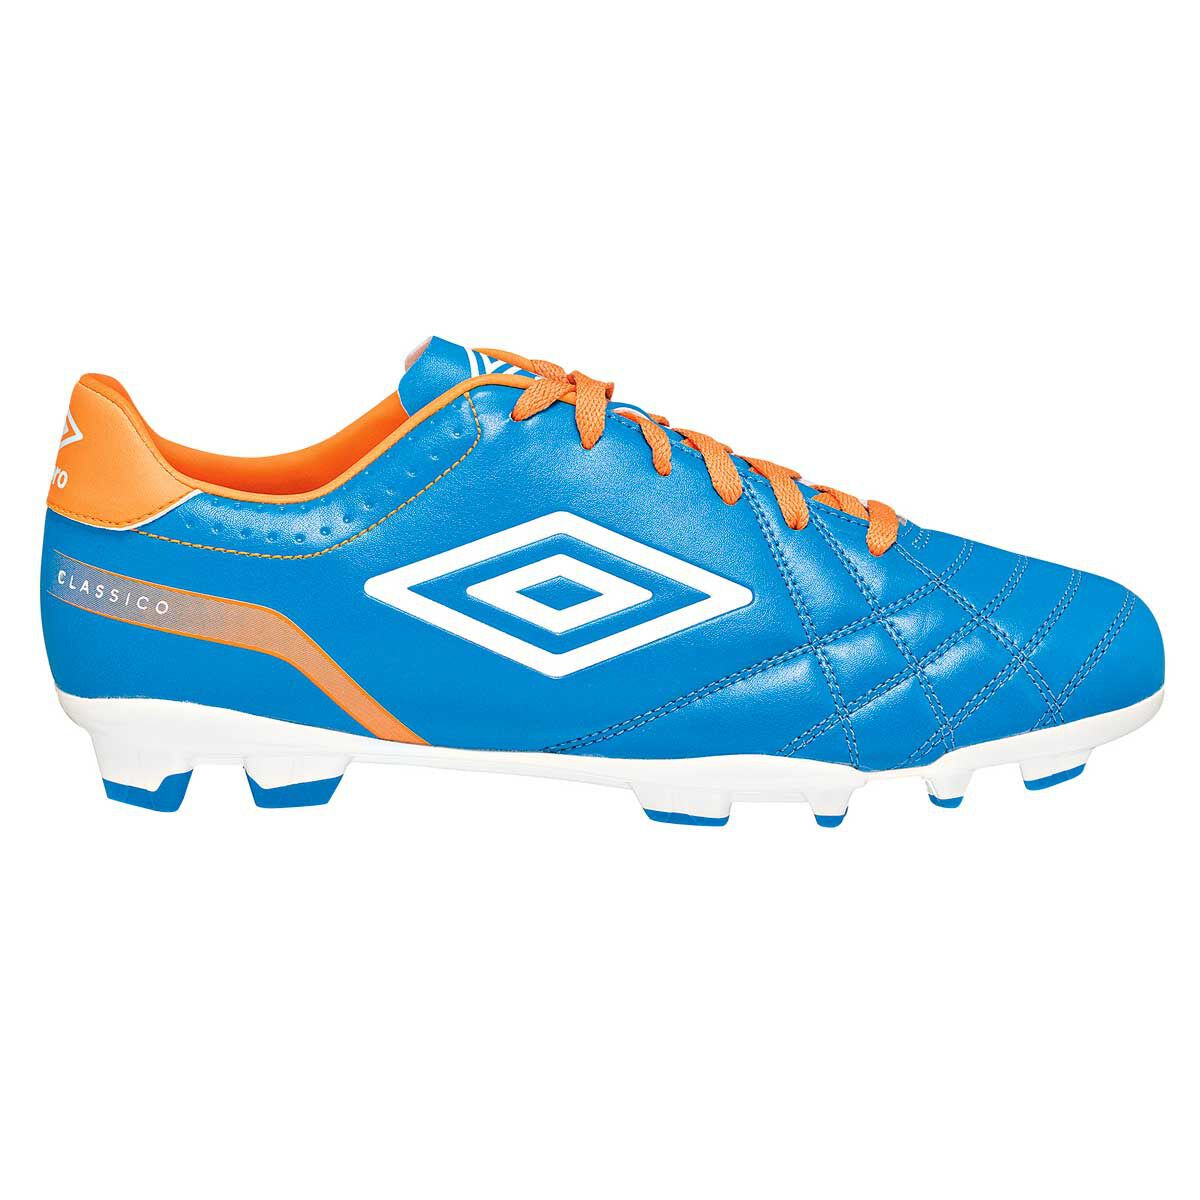 Umbro Classico 4 Junior Football Boots | Rebel Sport